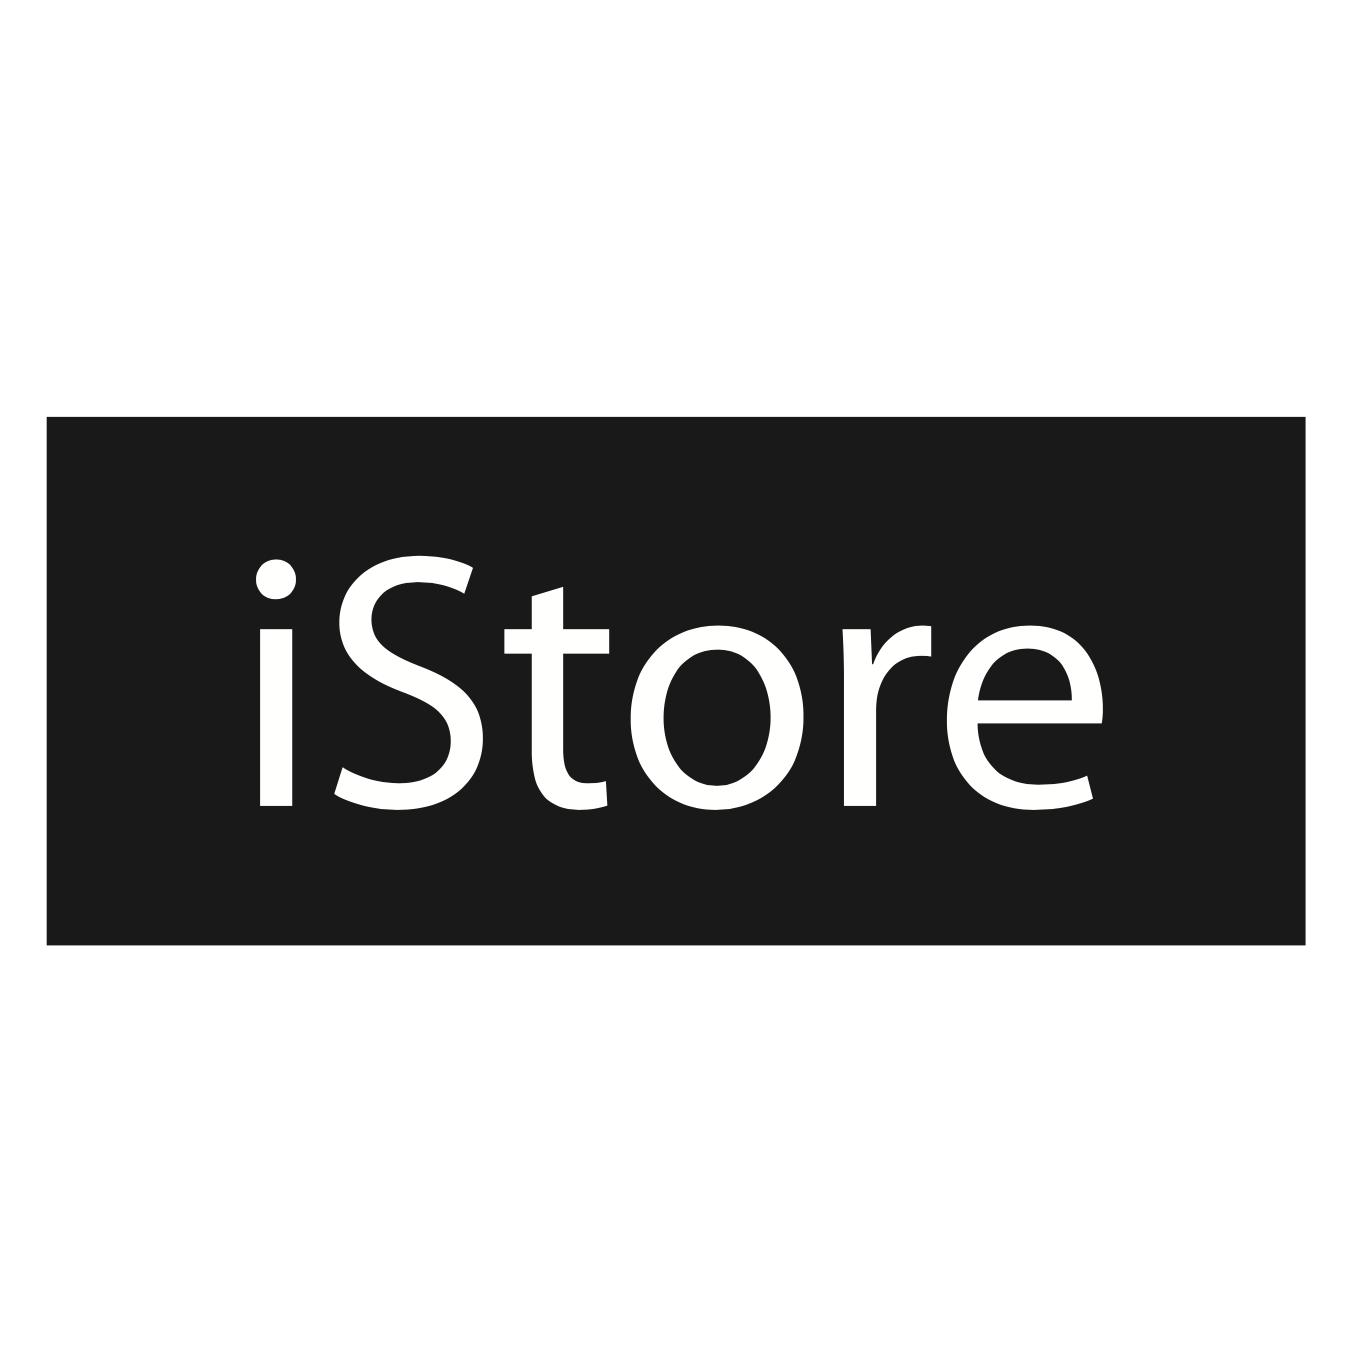 iPhone 6 16GB - Space Grey